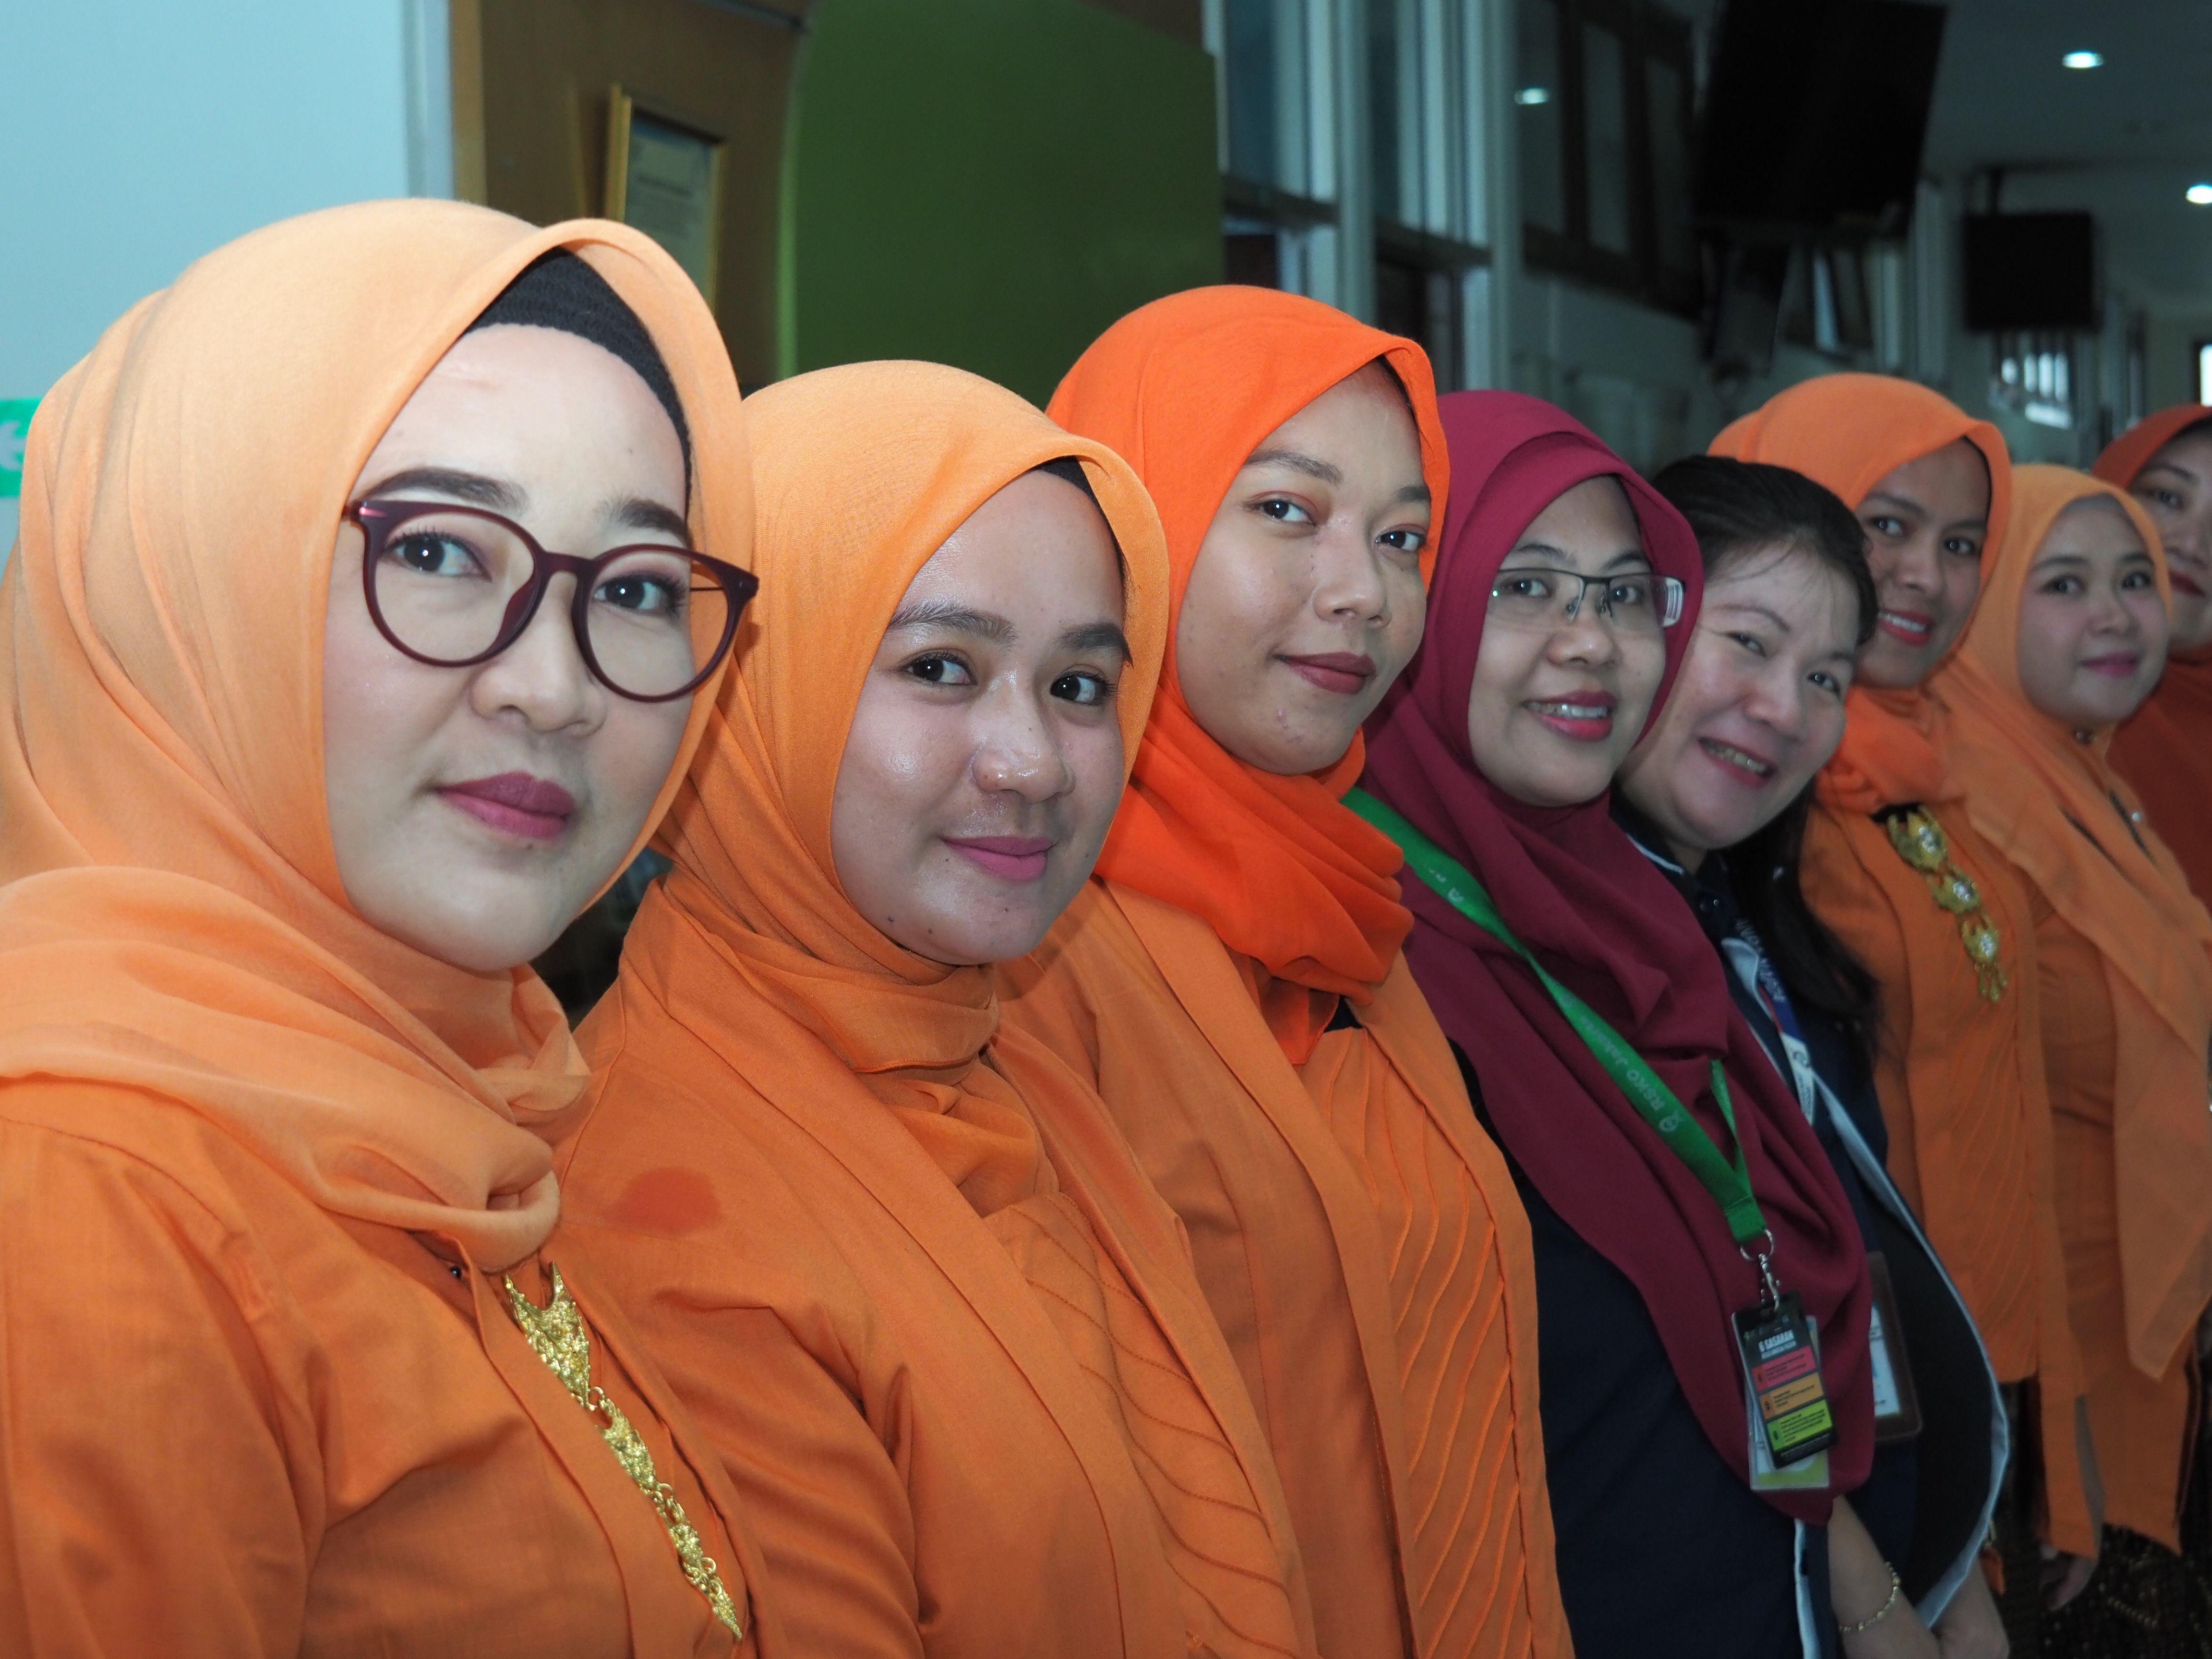 Deskripsi I ASN RSKO Jakarta dengan senang hari melaksanakan penilaian SNARS oleh KARS I Sumber Foto : dokpri